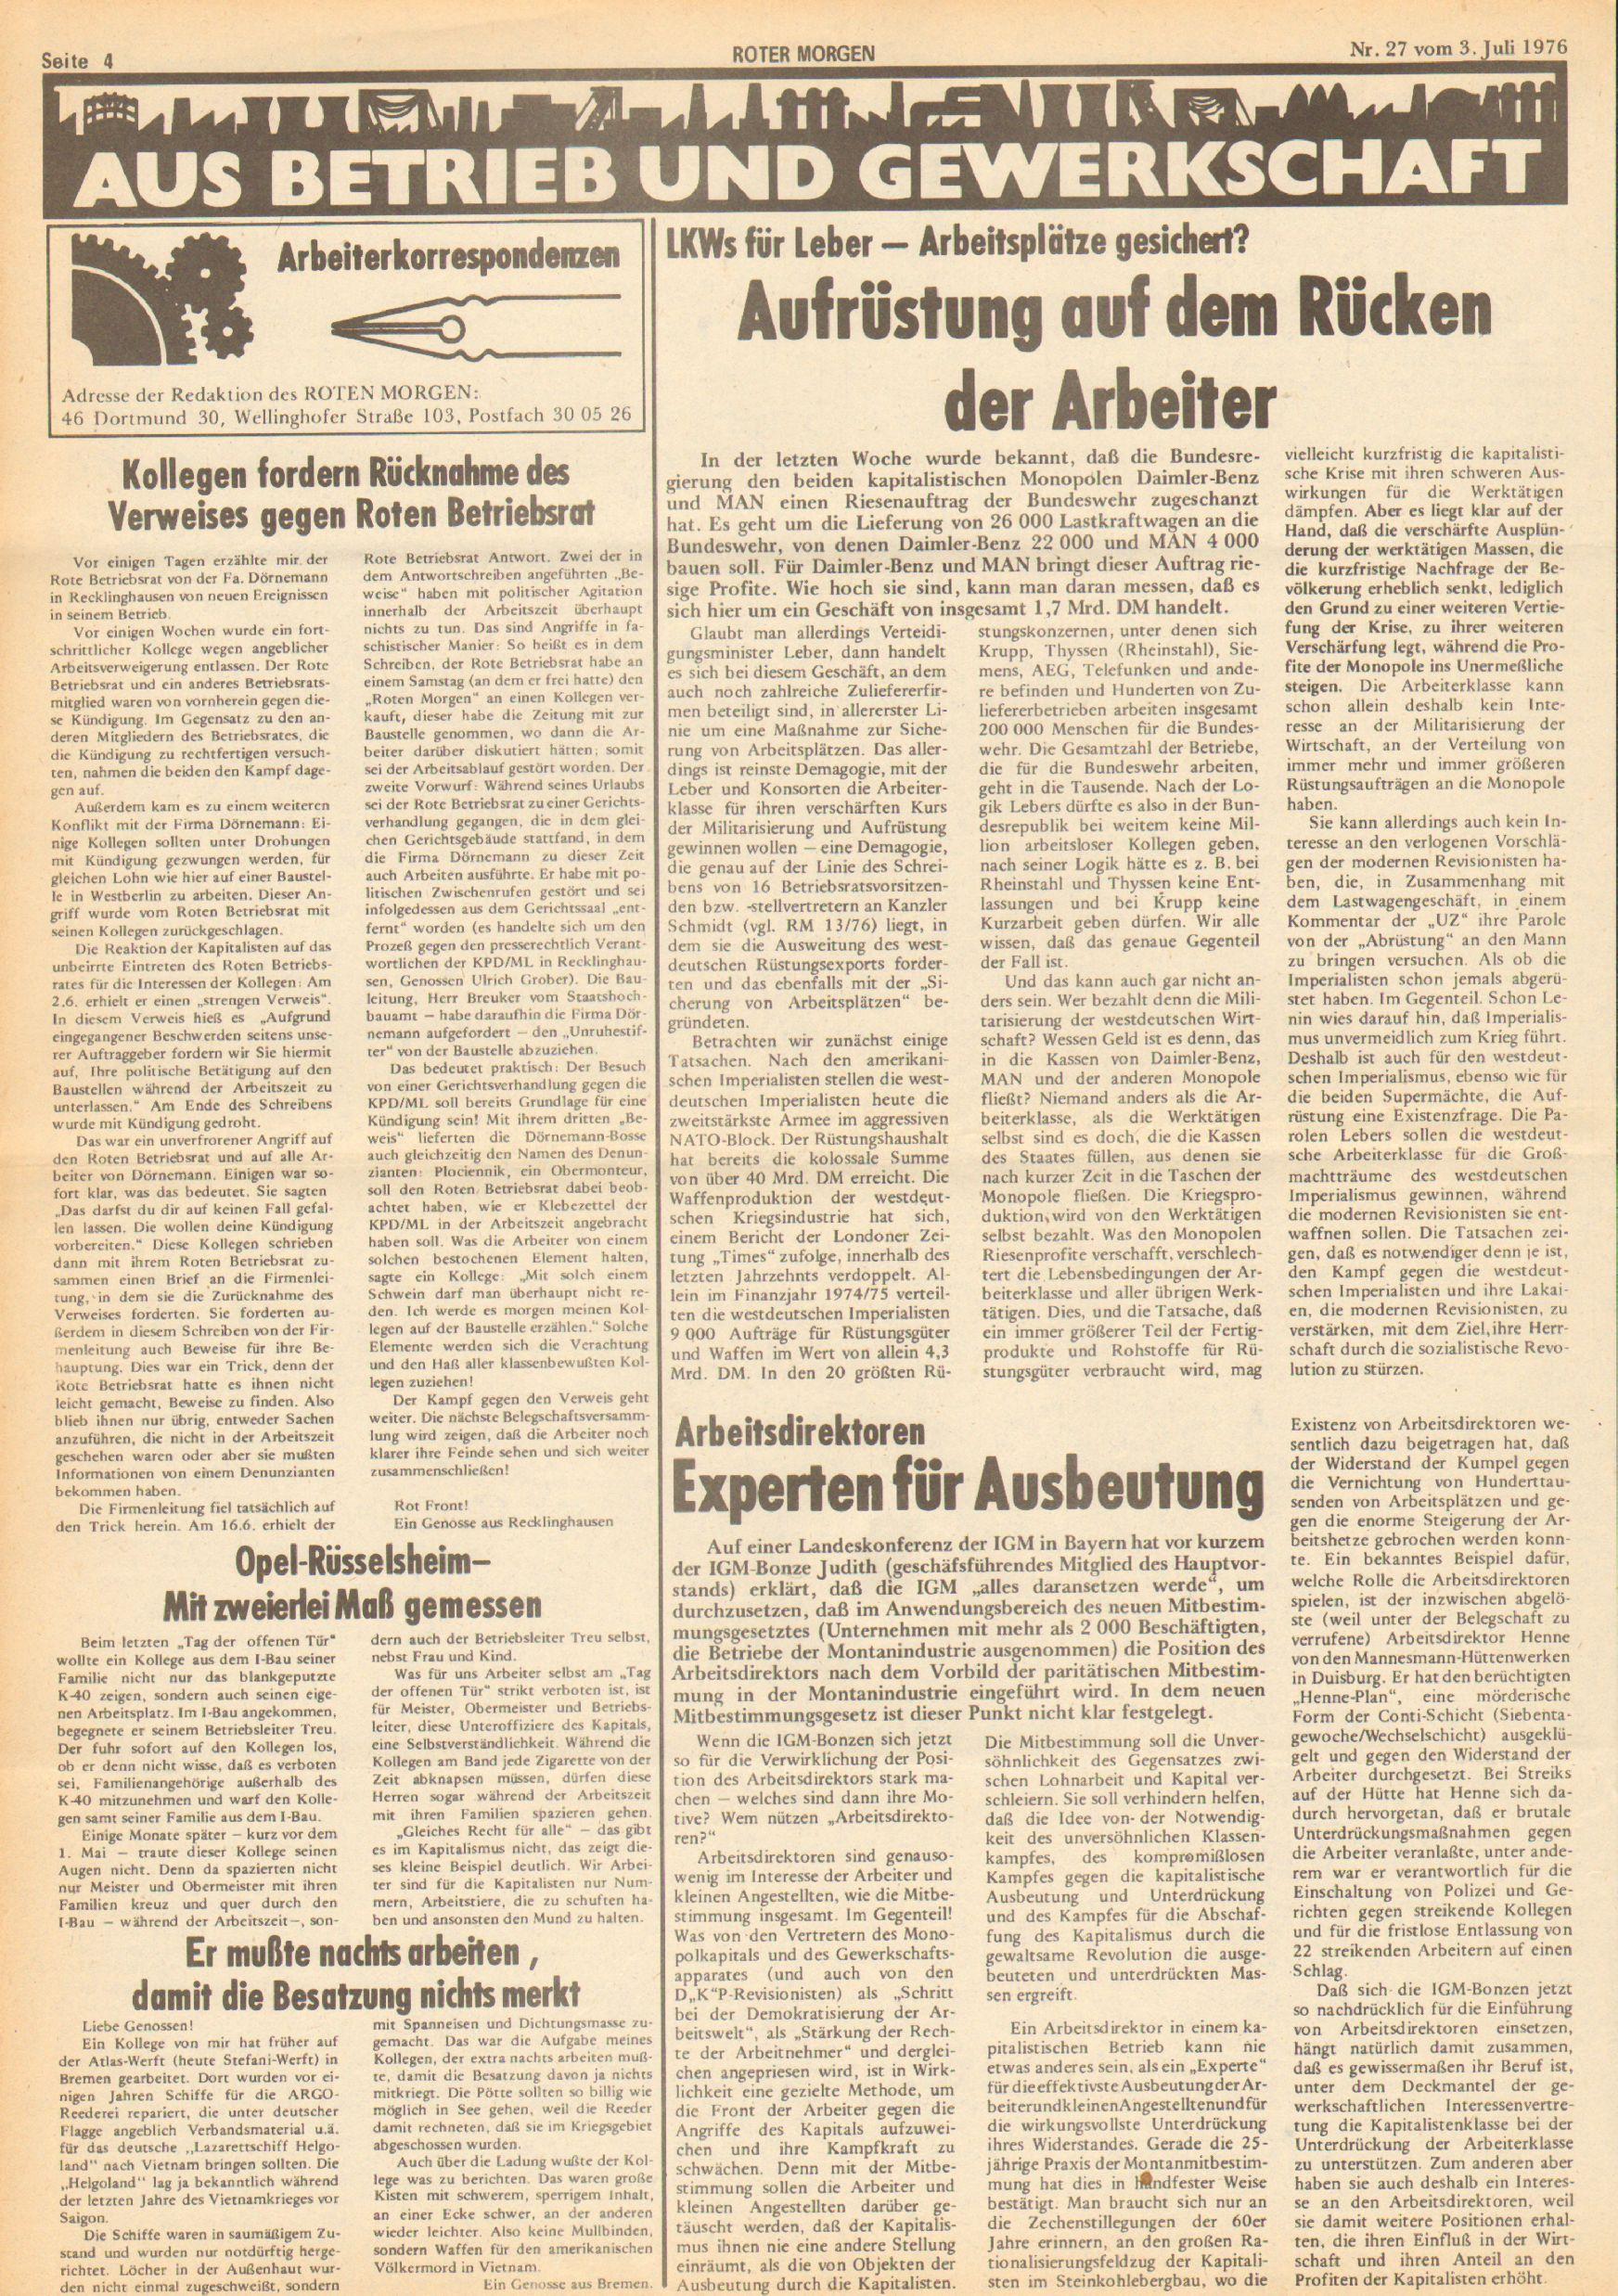 Roter Morgen, 10. Jg., 3. Juli 1976, Nr. 27, Seite 4